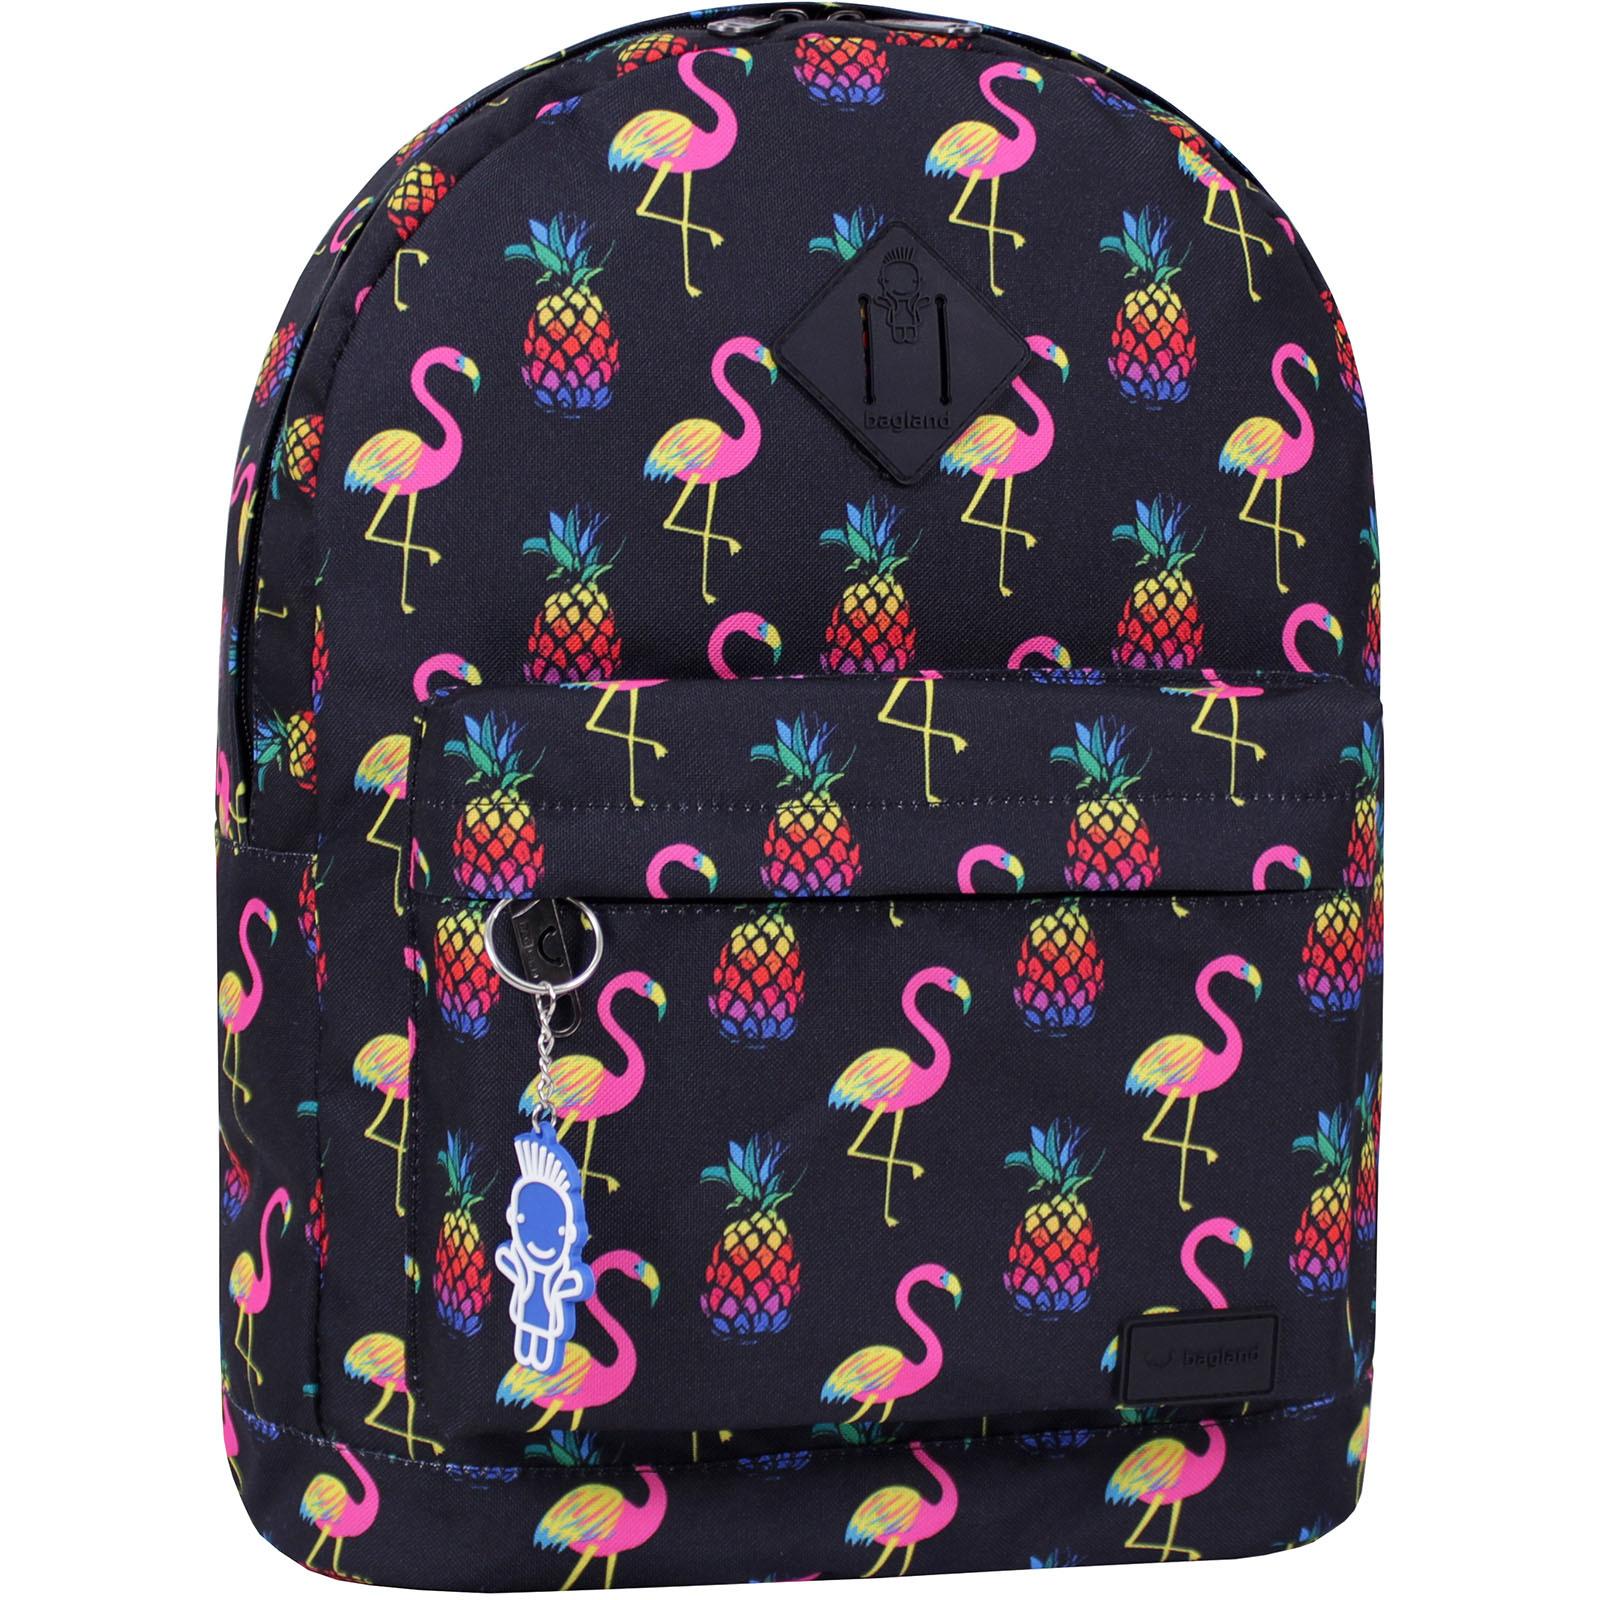 Городские рюкзаки Рюкзак Bagland Молодежный (дизайн) 17 л. сублімація 361 (00533664) IMG_8246_суб.361_.JPG